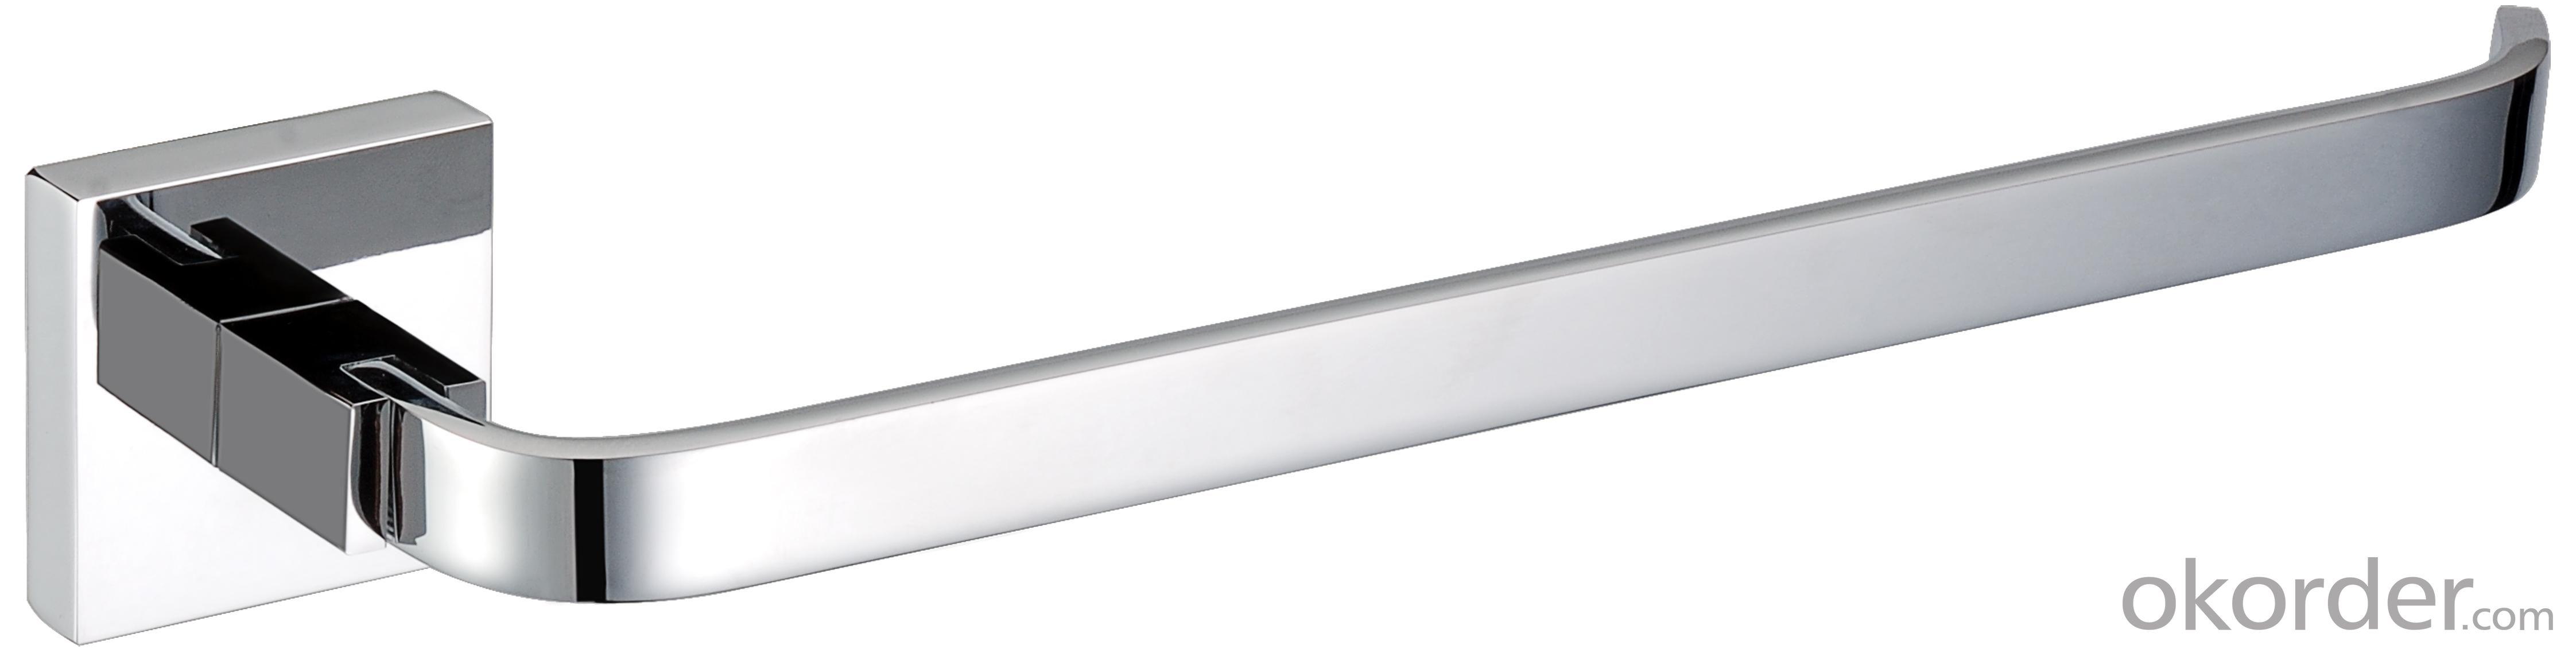 New Design Exquisite Decorative Bathroom Accessories Solid Brass Towel Ring